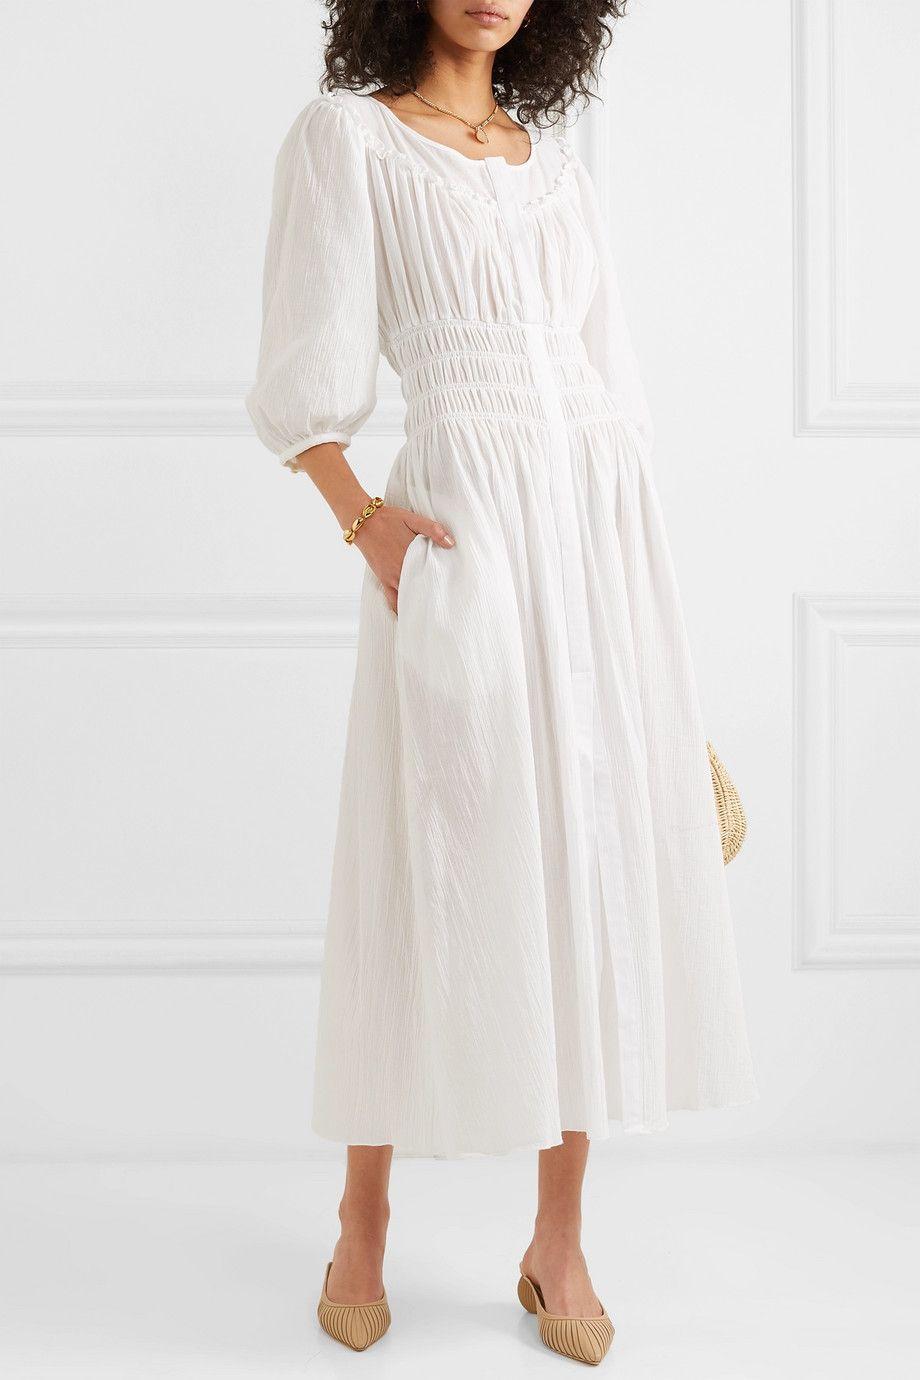 White Arabella Shirred Cotton Gauze Midi Dress Three Graces London White Flowy Dress Dresses White Dress Summer [ 1380 x 920 Pixel ]